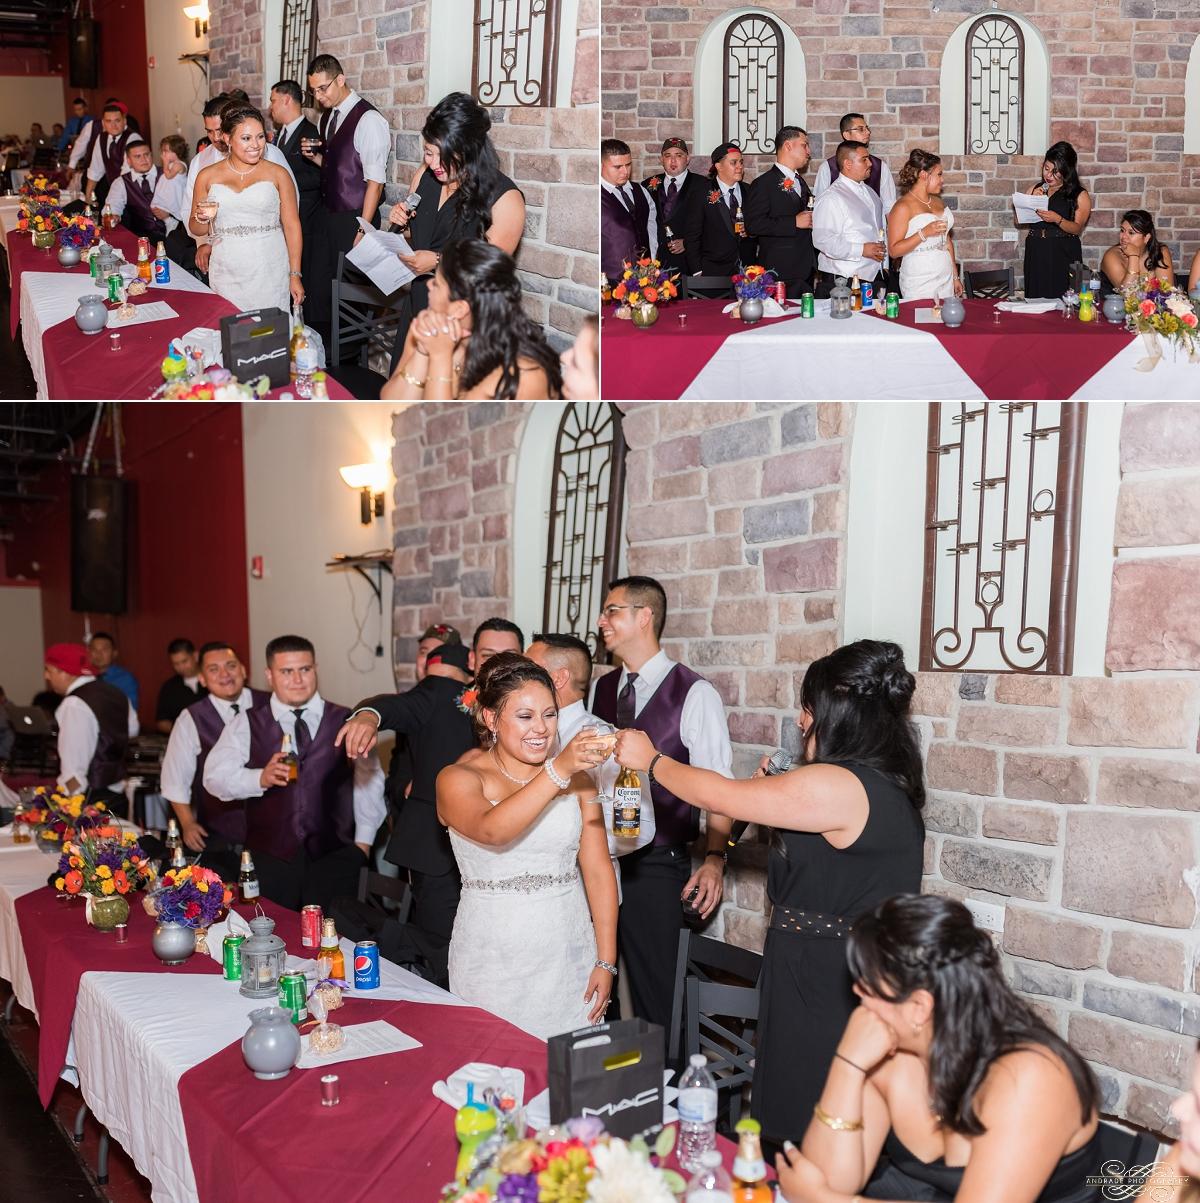 Janette + Louie Estebans Wedding Photography in Naperville - Naperville Wedding Photographer_0072.jpg